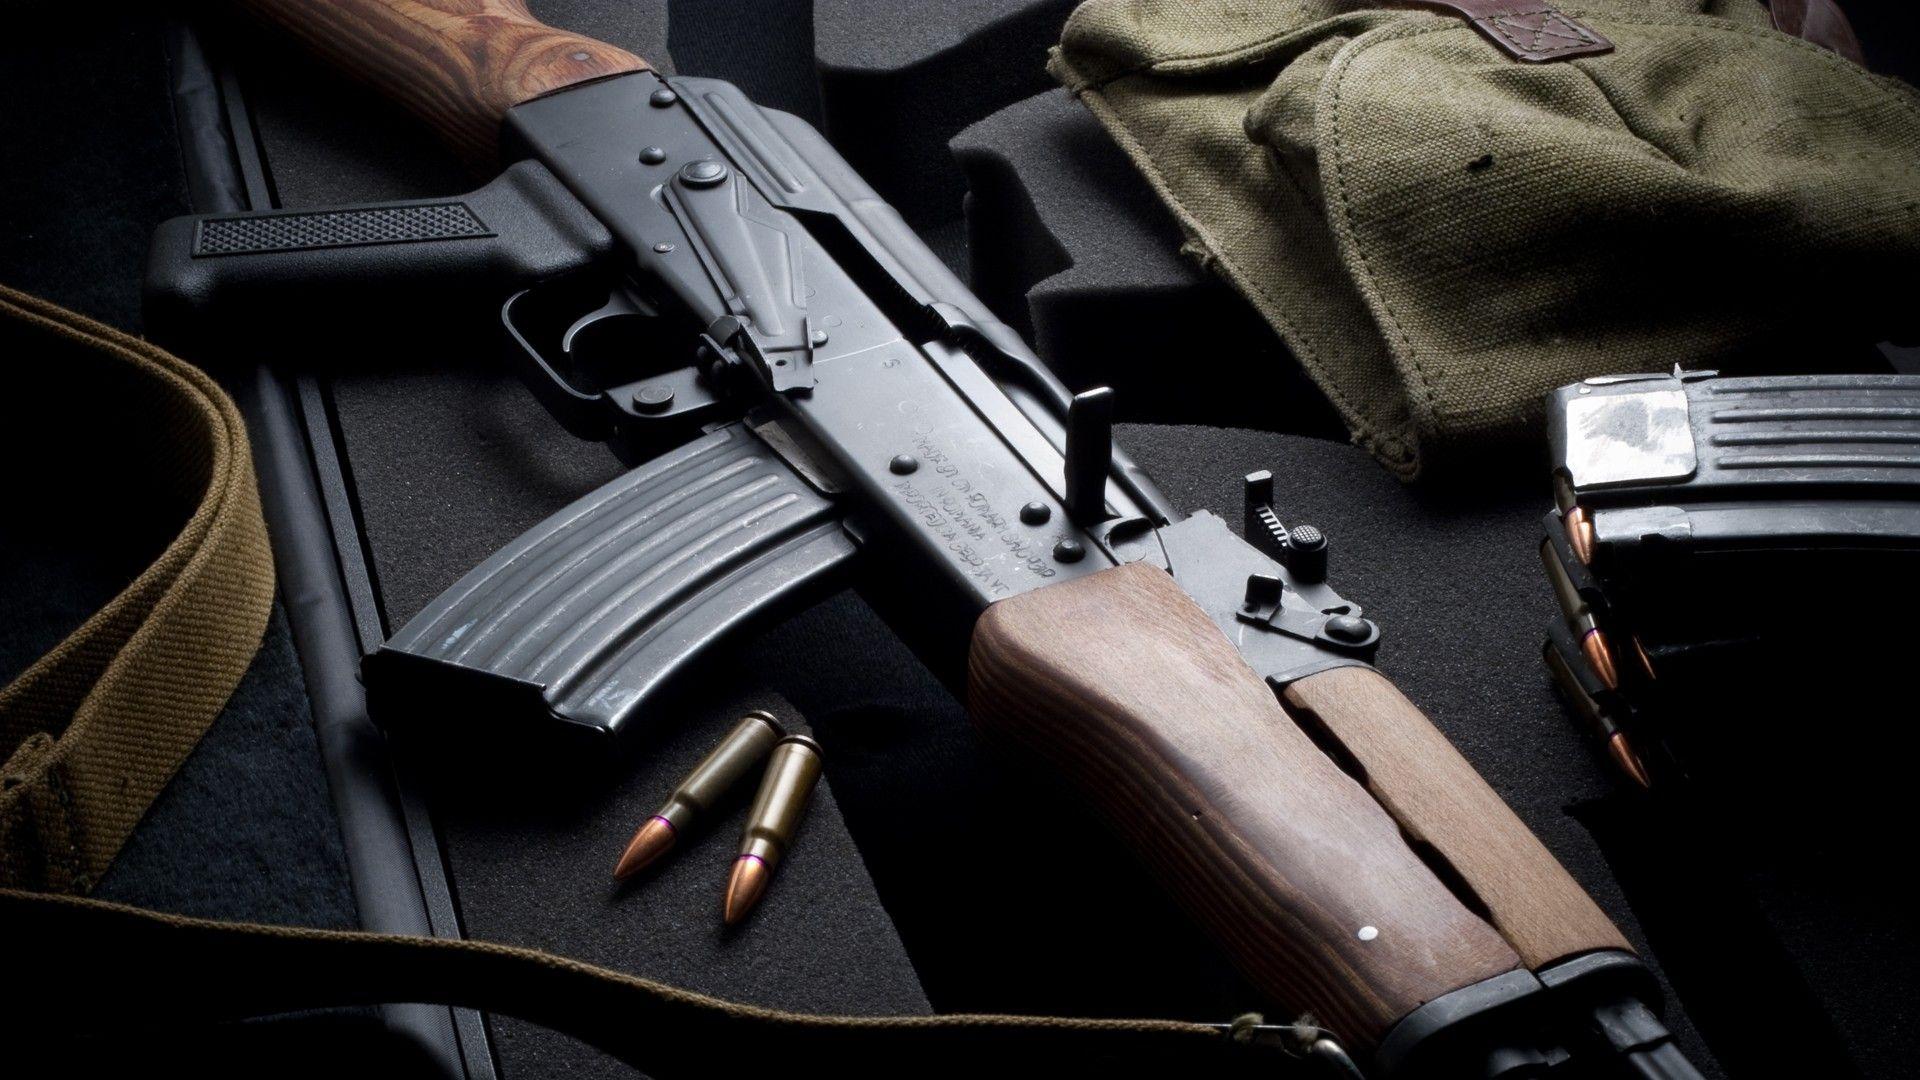 Free Download New AK 47 Gun Images